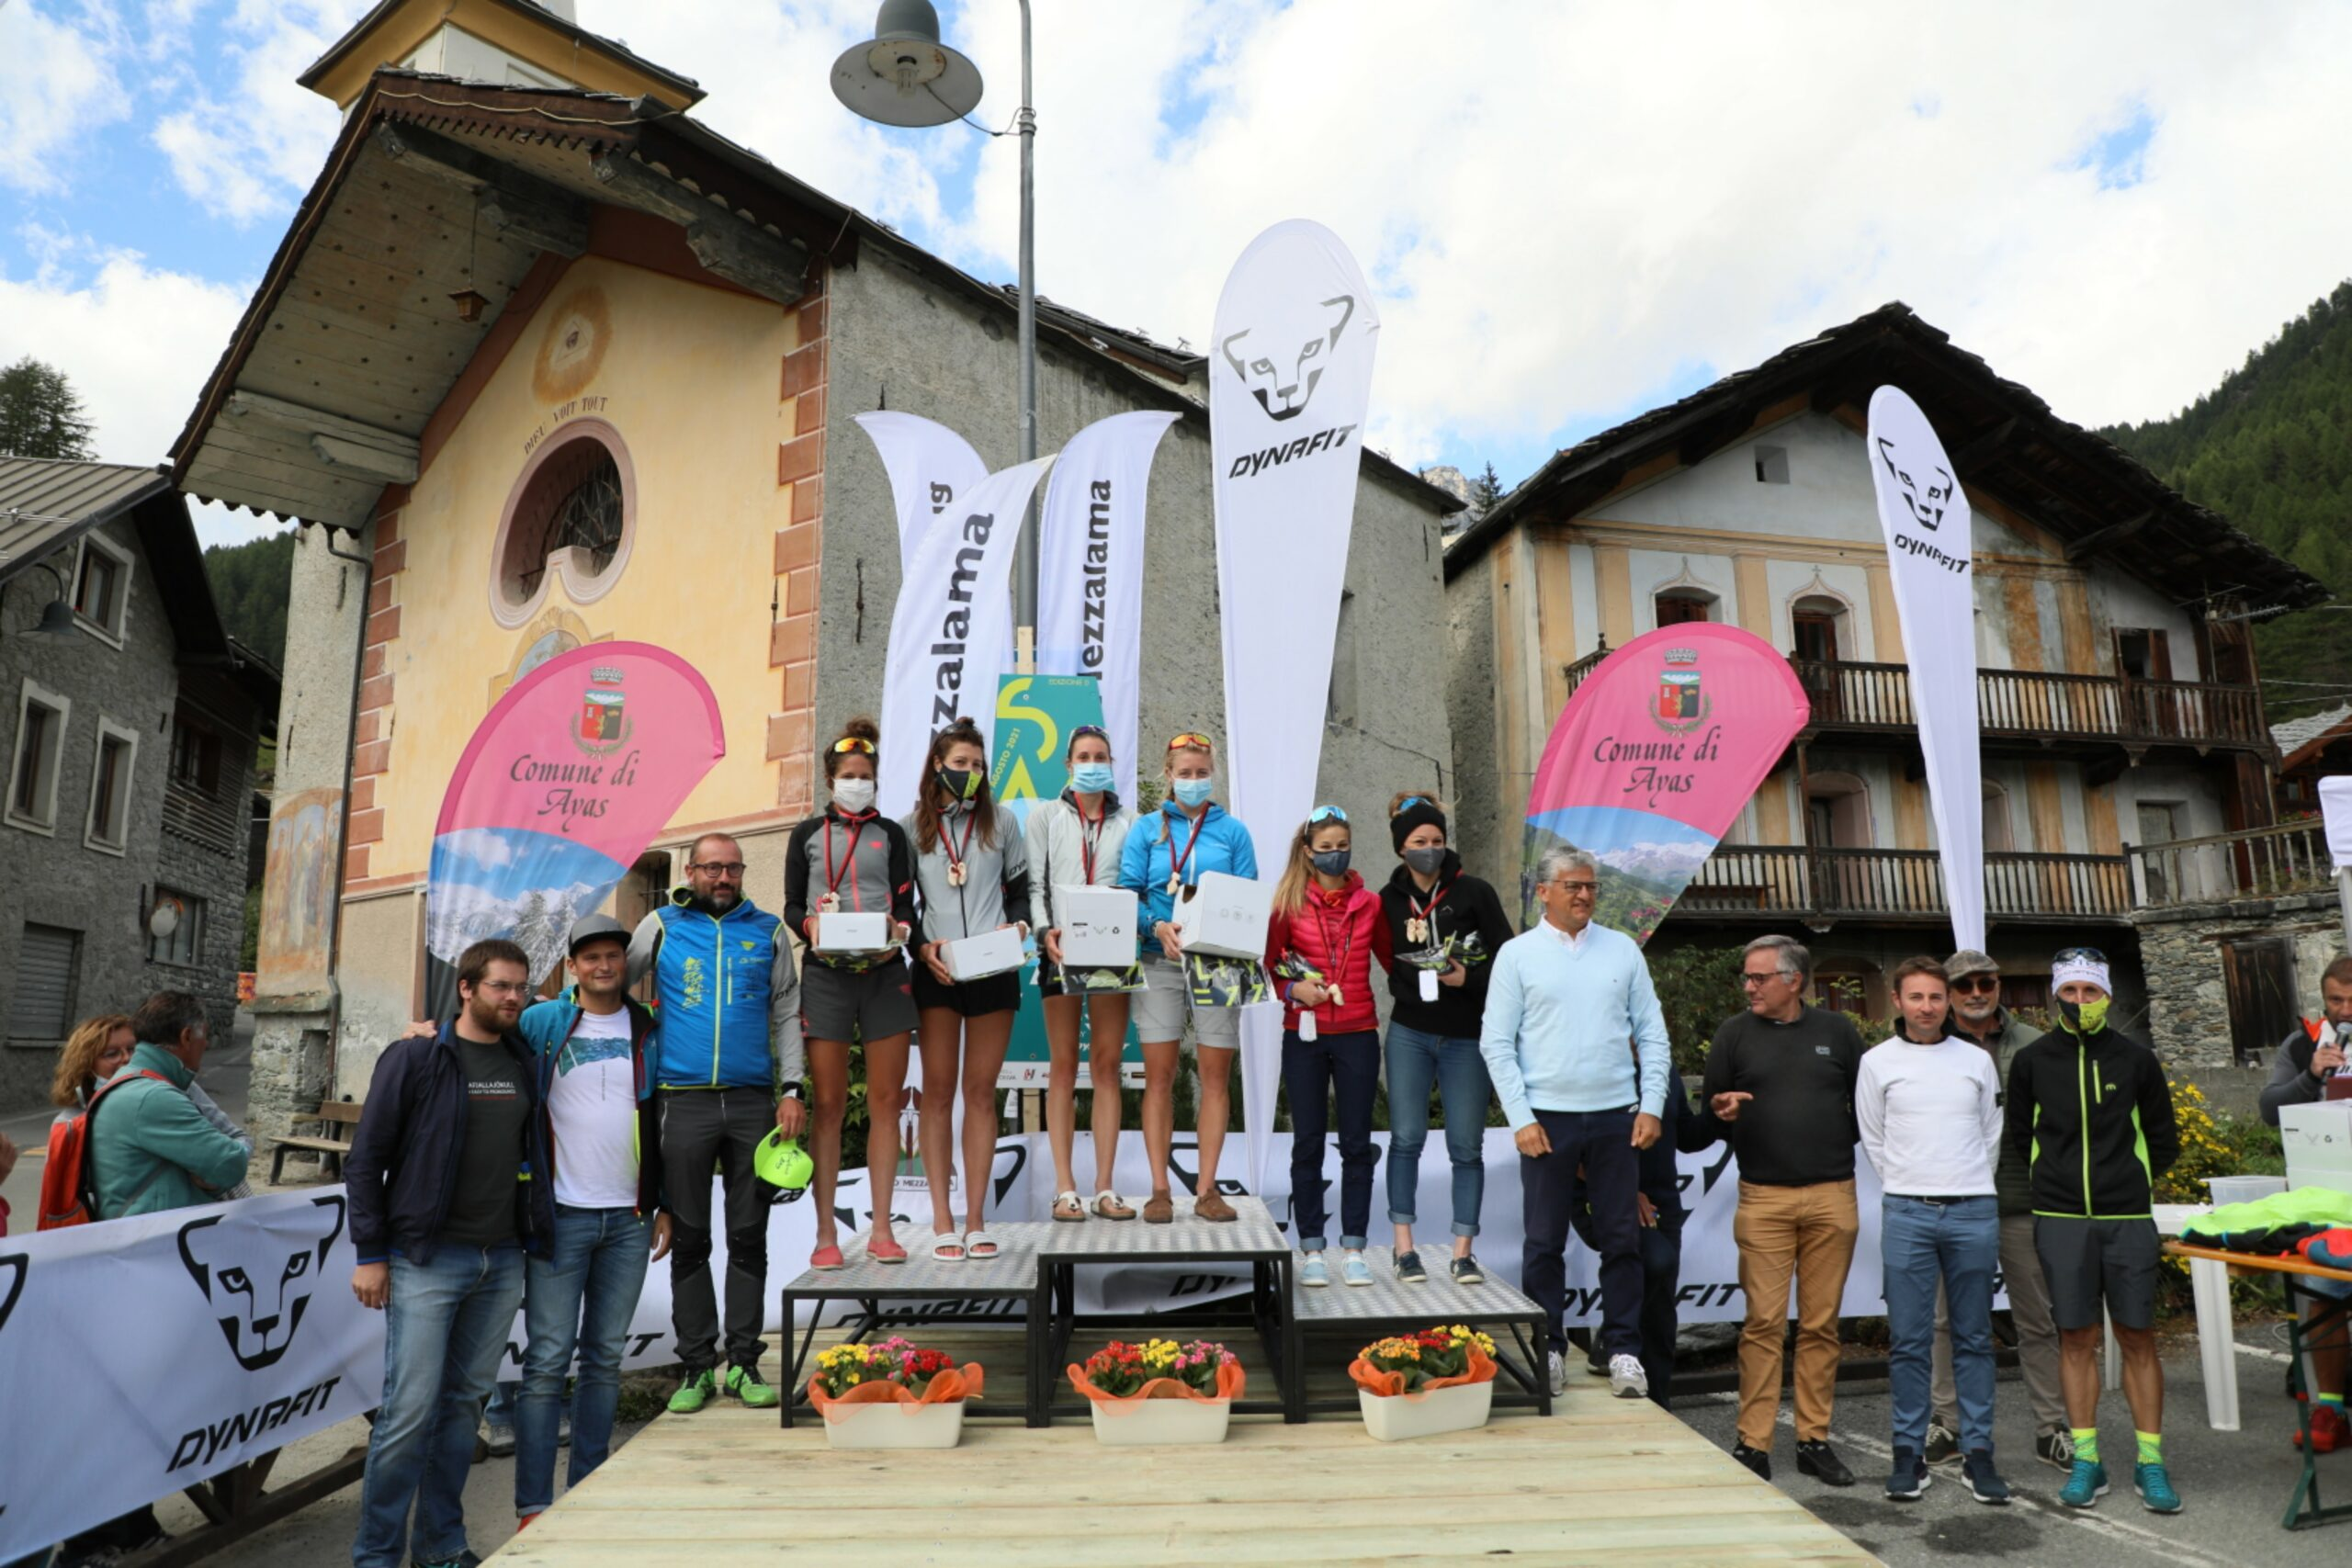 Skyclimb Mezzalama 2021 - Castore - foto credits Trofeo Mezzalama